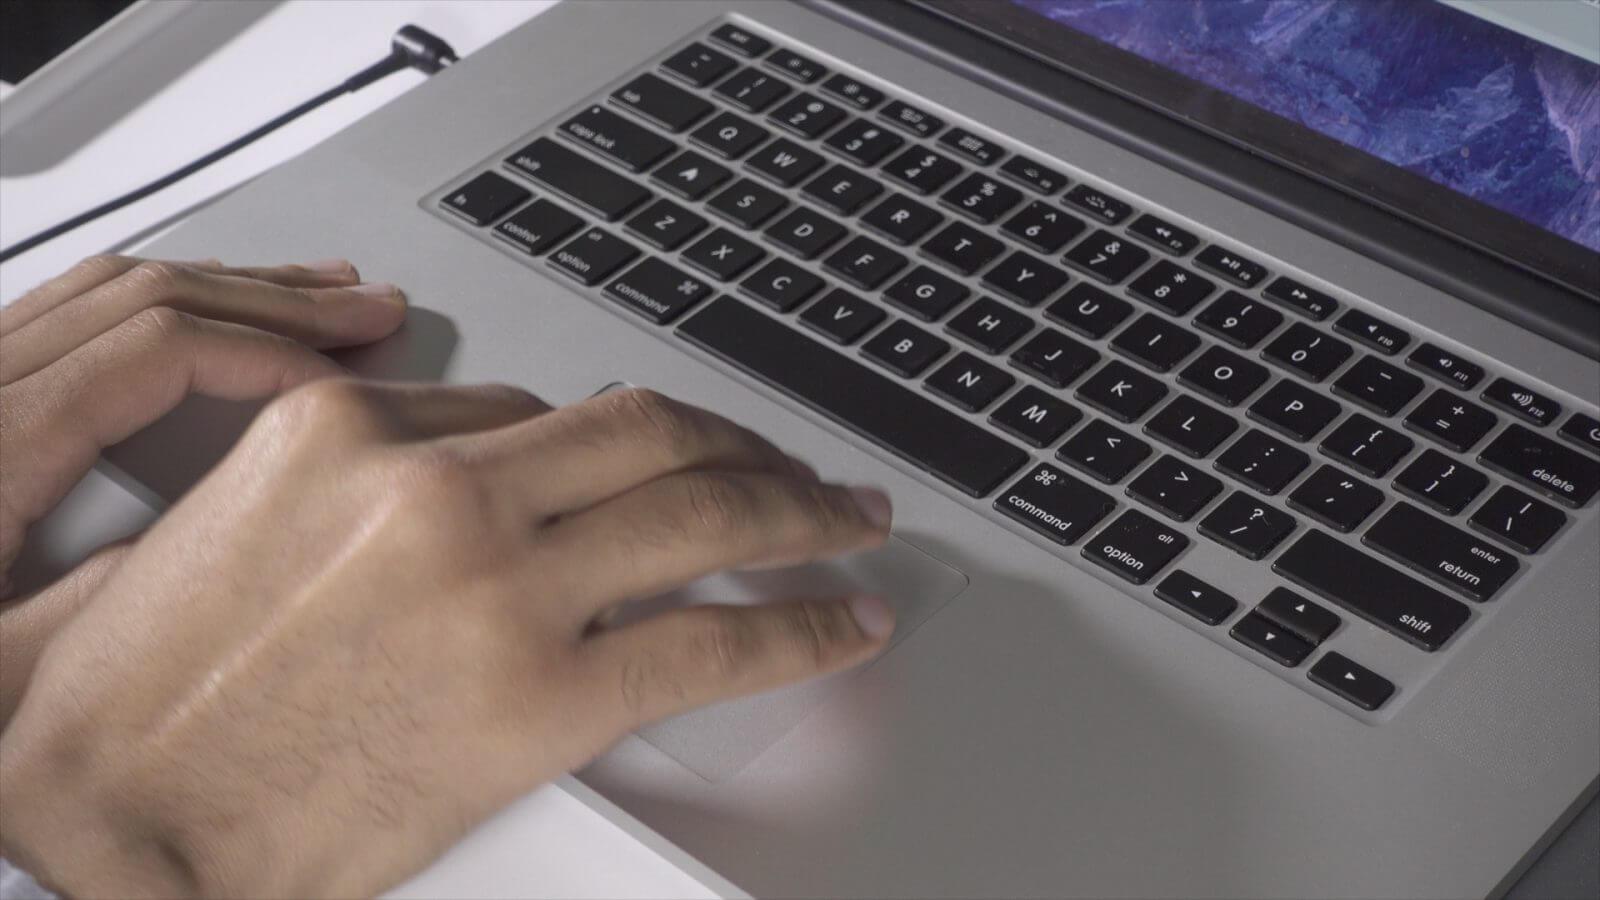 Mac Touchpad Ayarları Macbook Trackpad İncelemesi Macbook Trackpad İncelemesi macbook ekran kaydirma